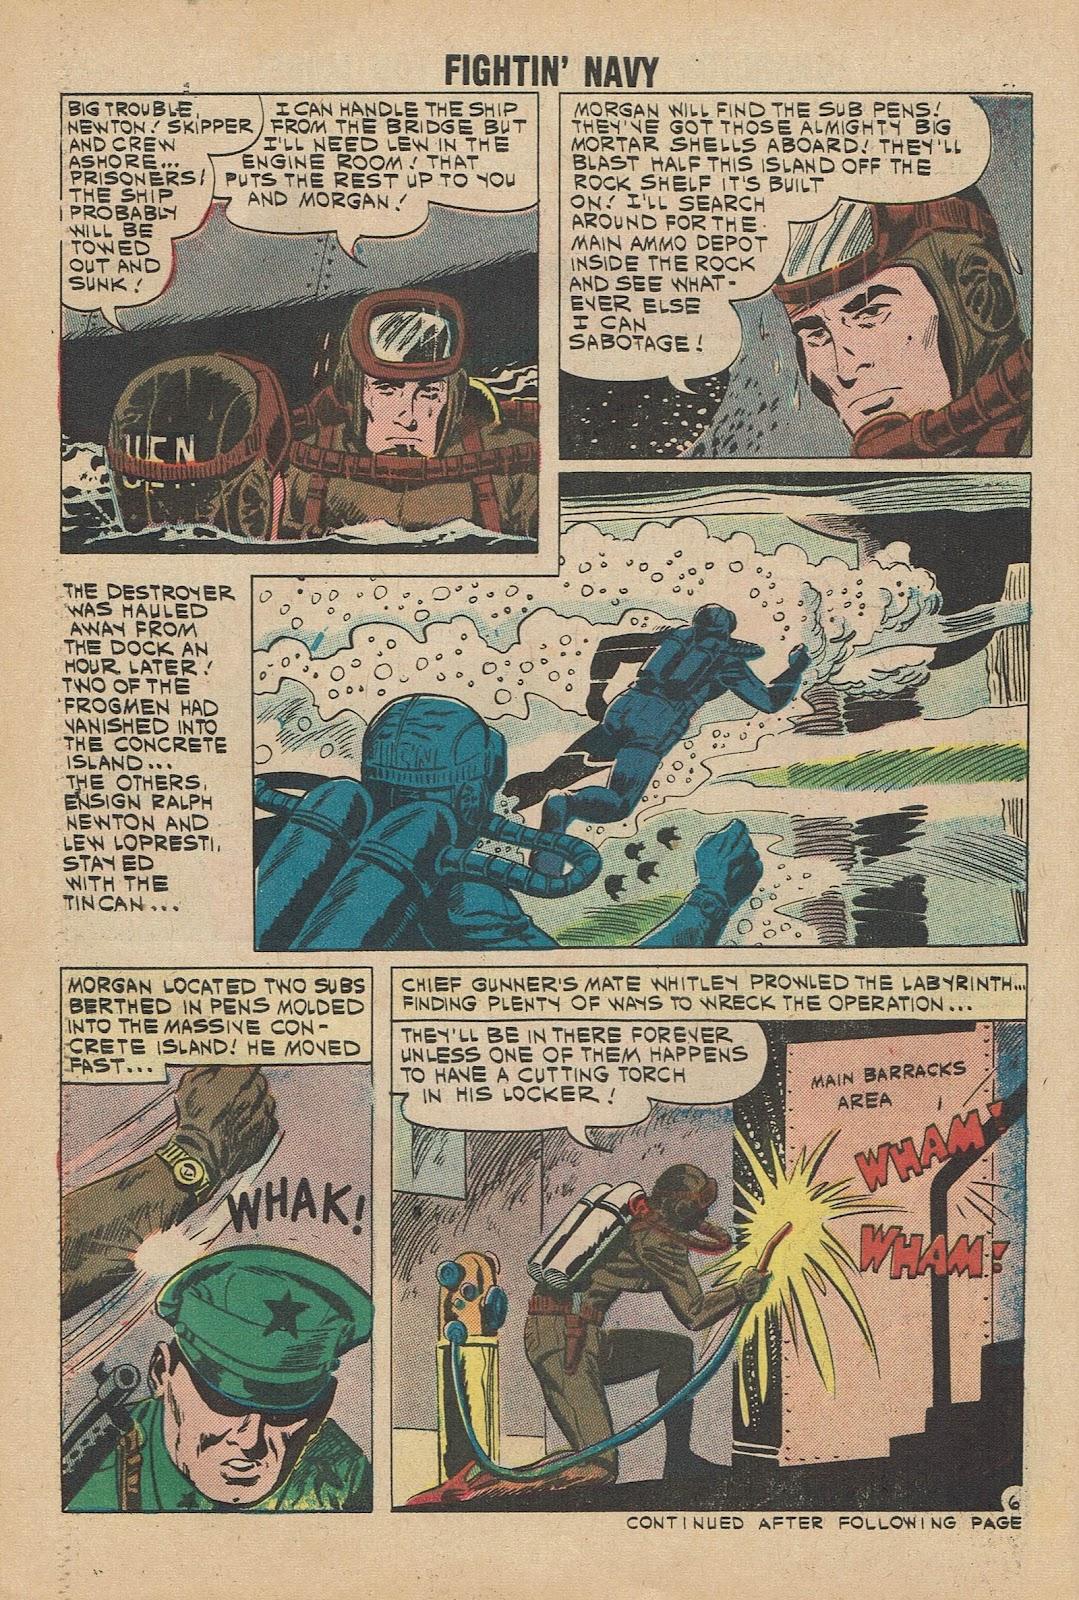 Read online Fightin' Navy comic -  Issue #98 - 30